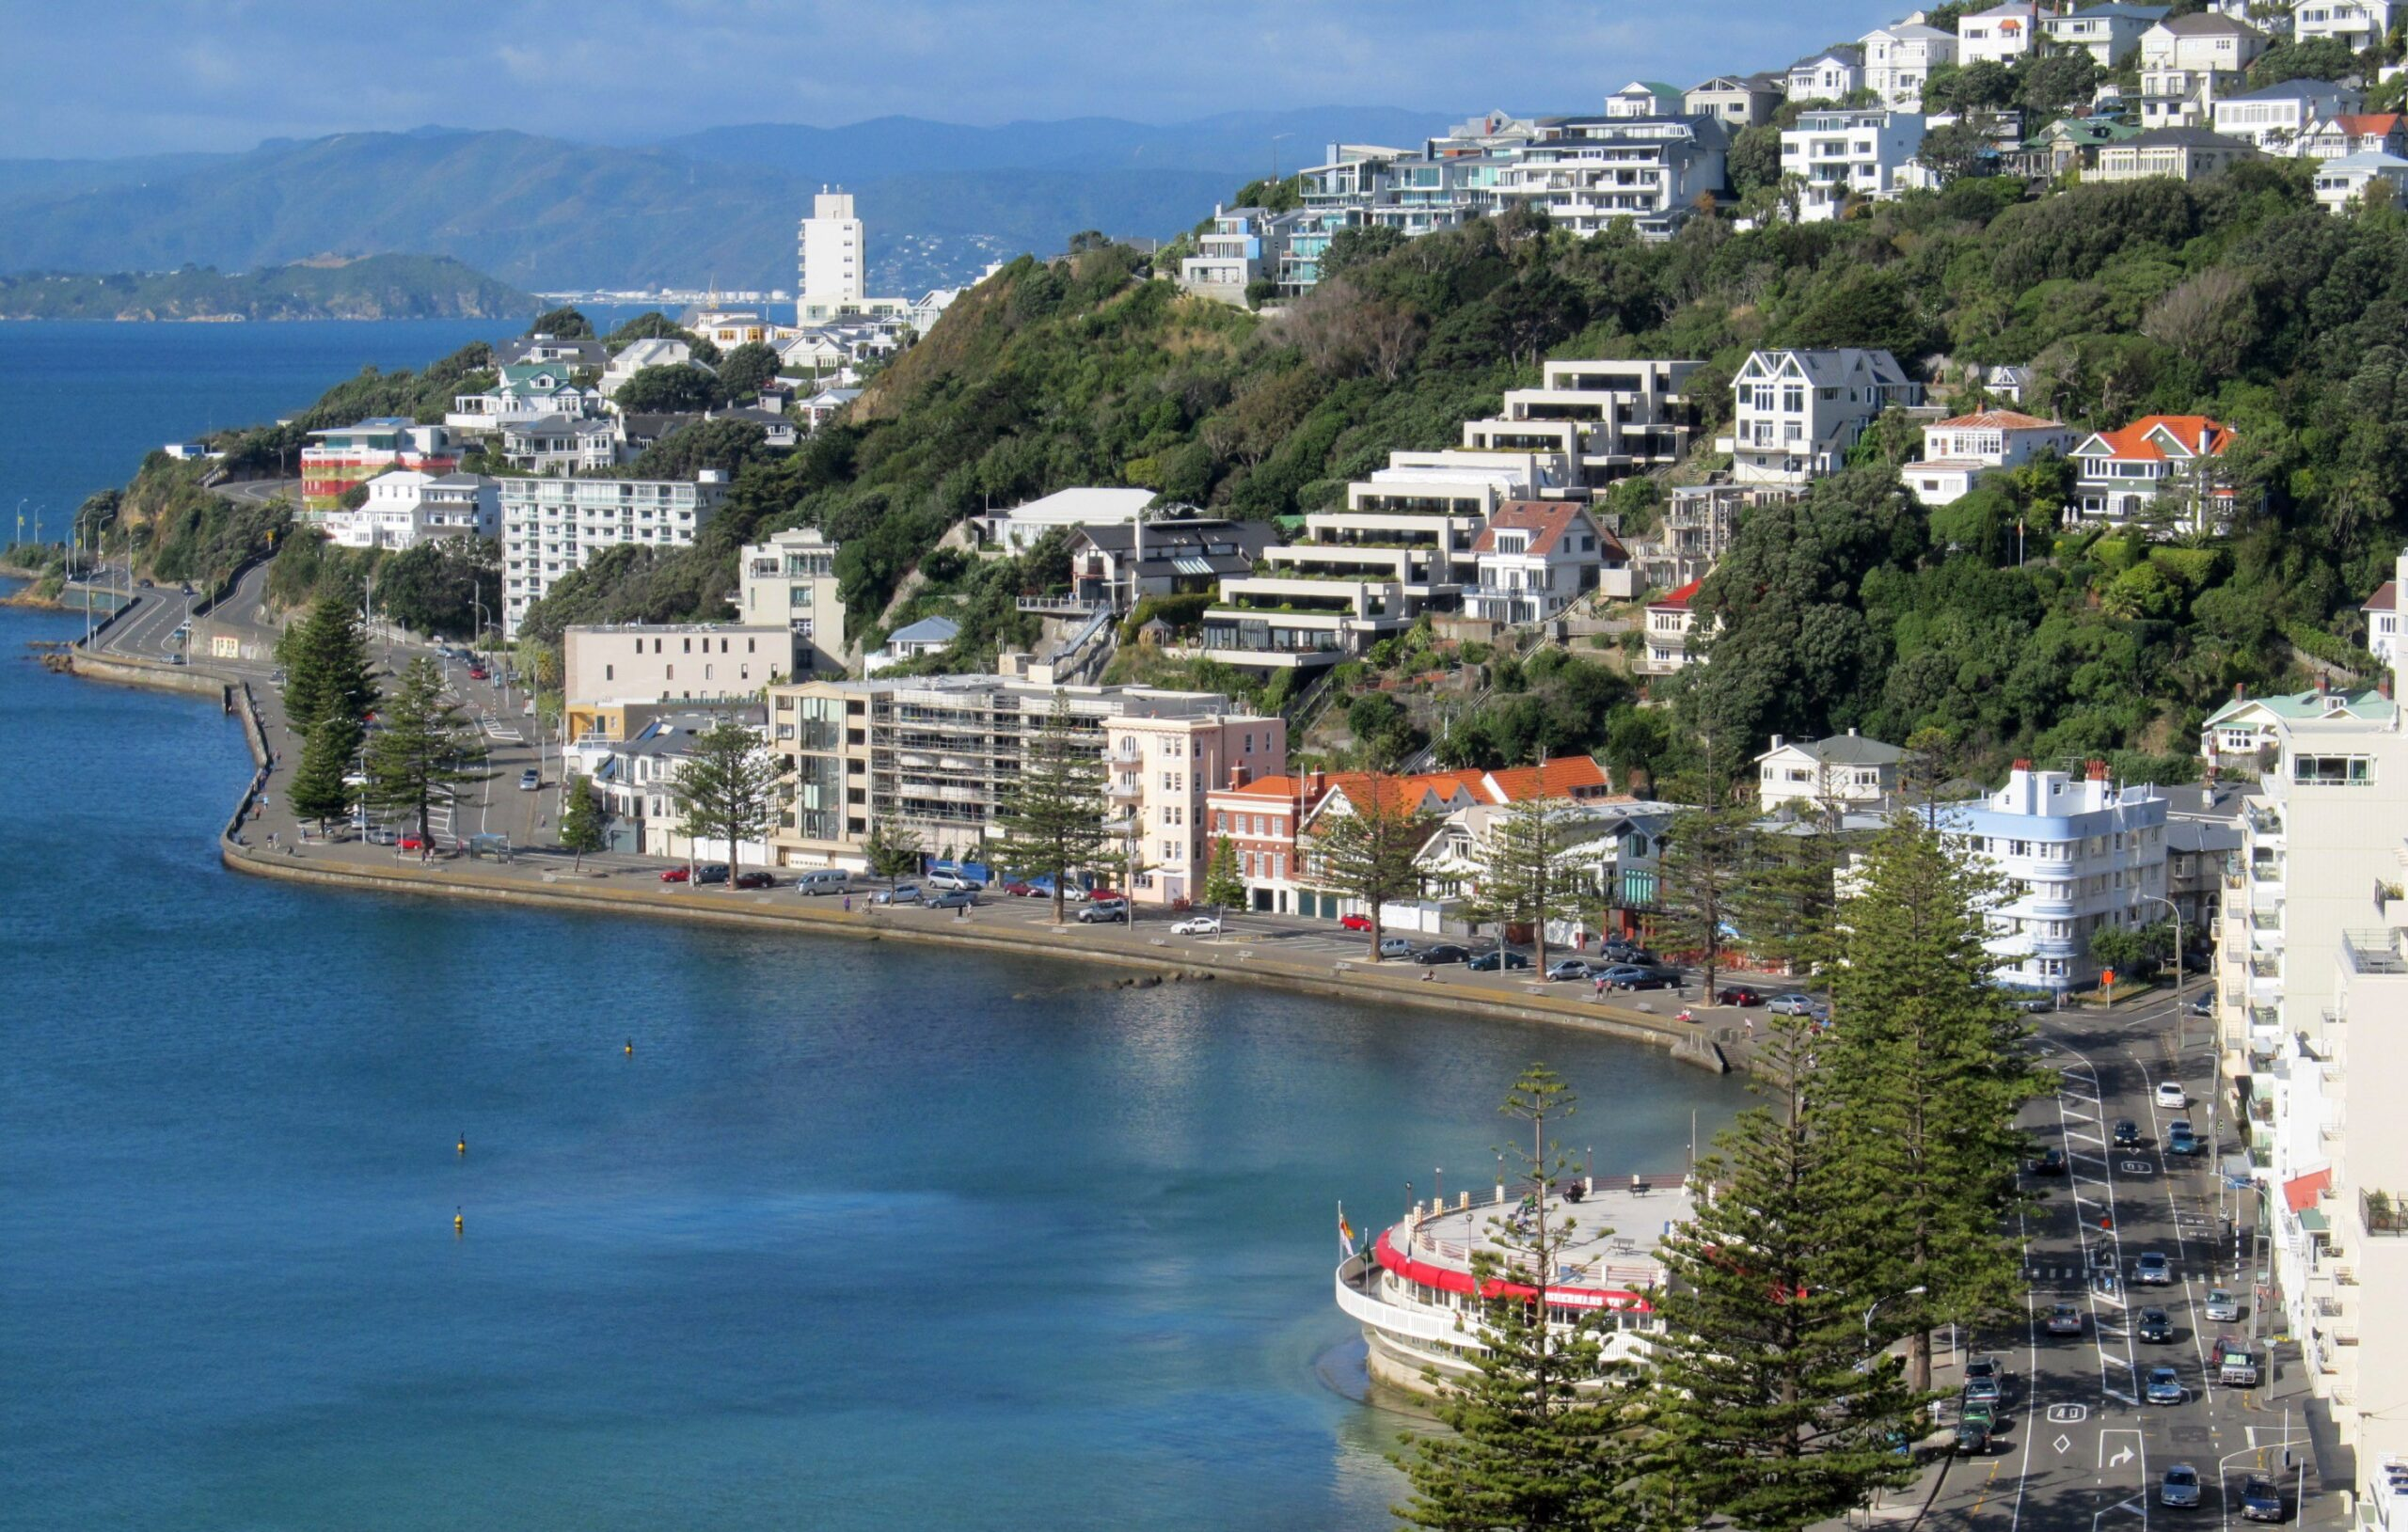 3-visto-de-estudante-neozelandes